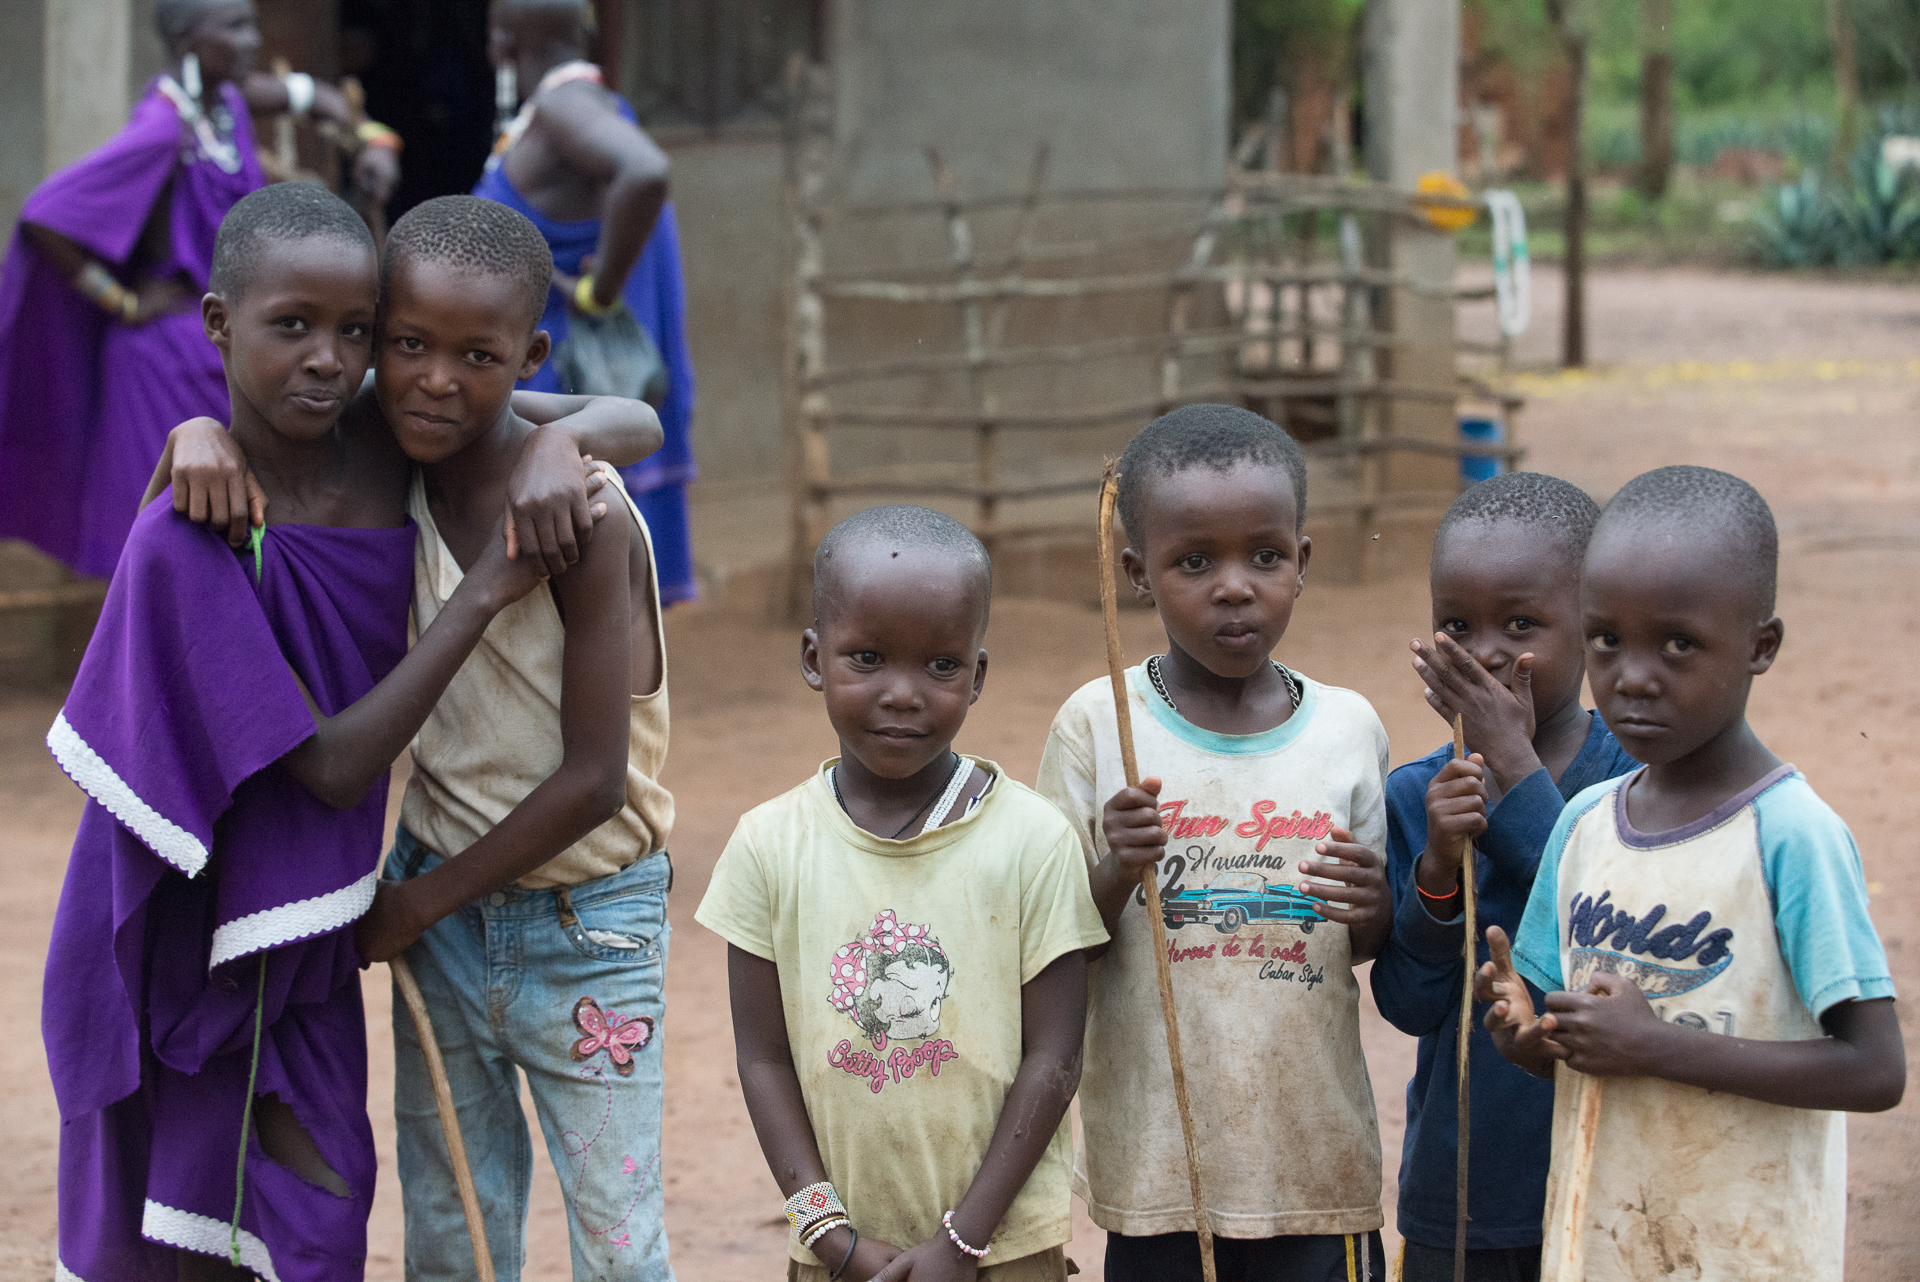 fd6557d7903 Ας κάνουμε το σχολείο πιο ανθρώπινο. 'Gongo Kids' Calling - Give and Fund  Crowdfunding